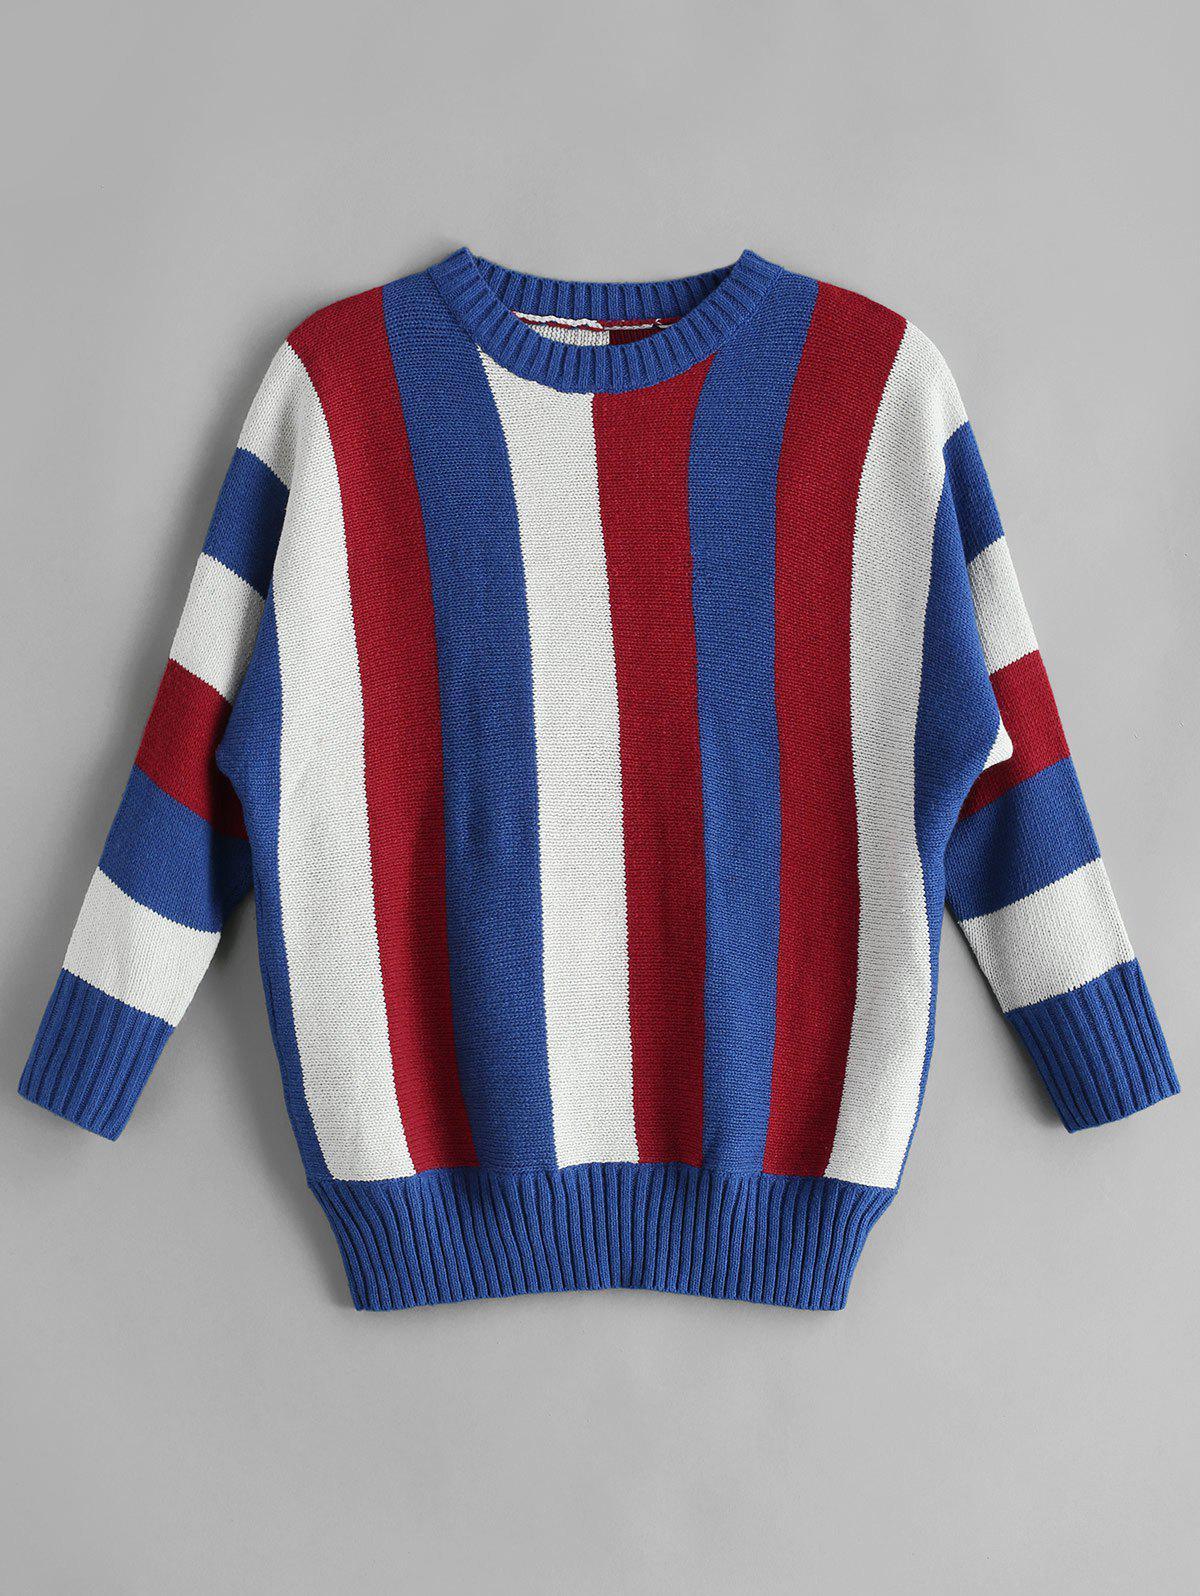 Colorful Striped Jumper Sweater